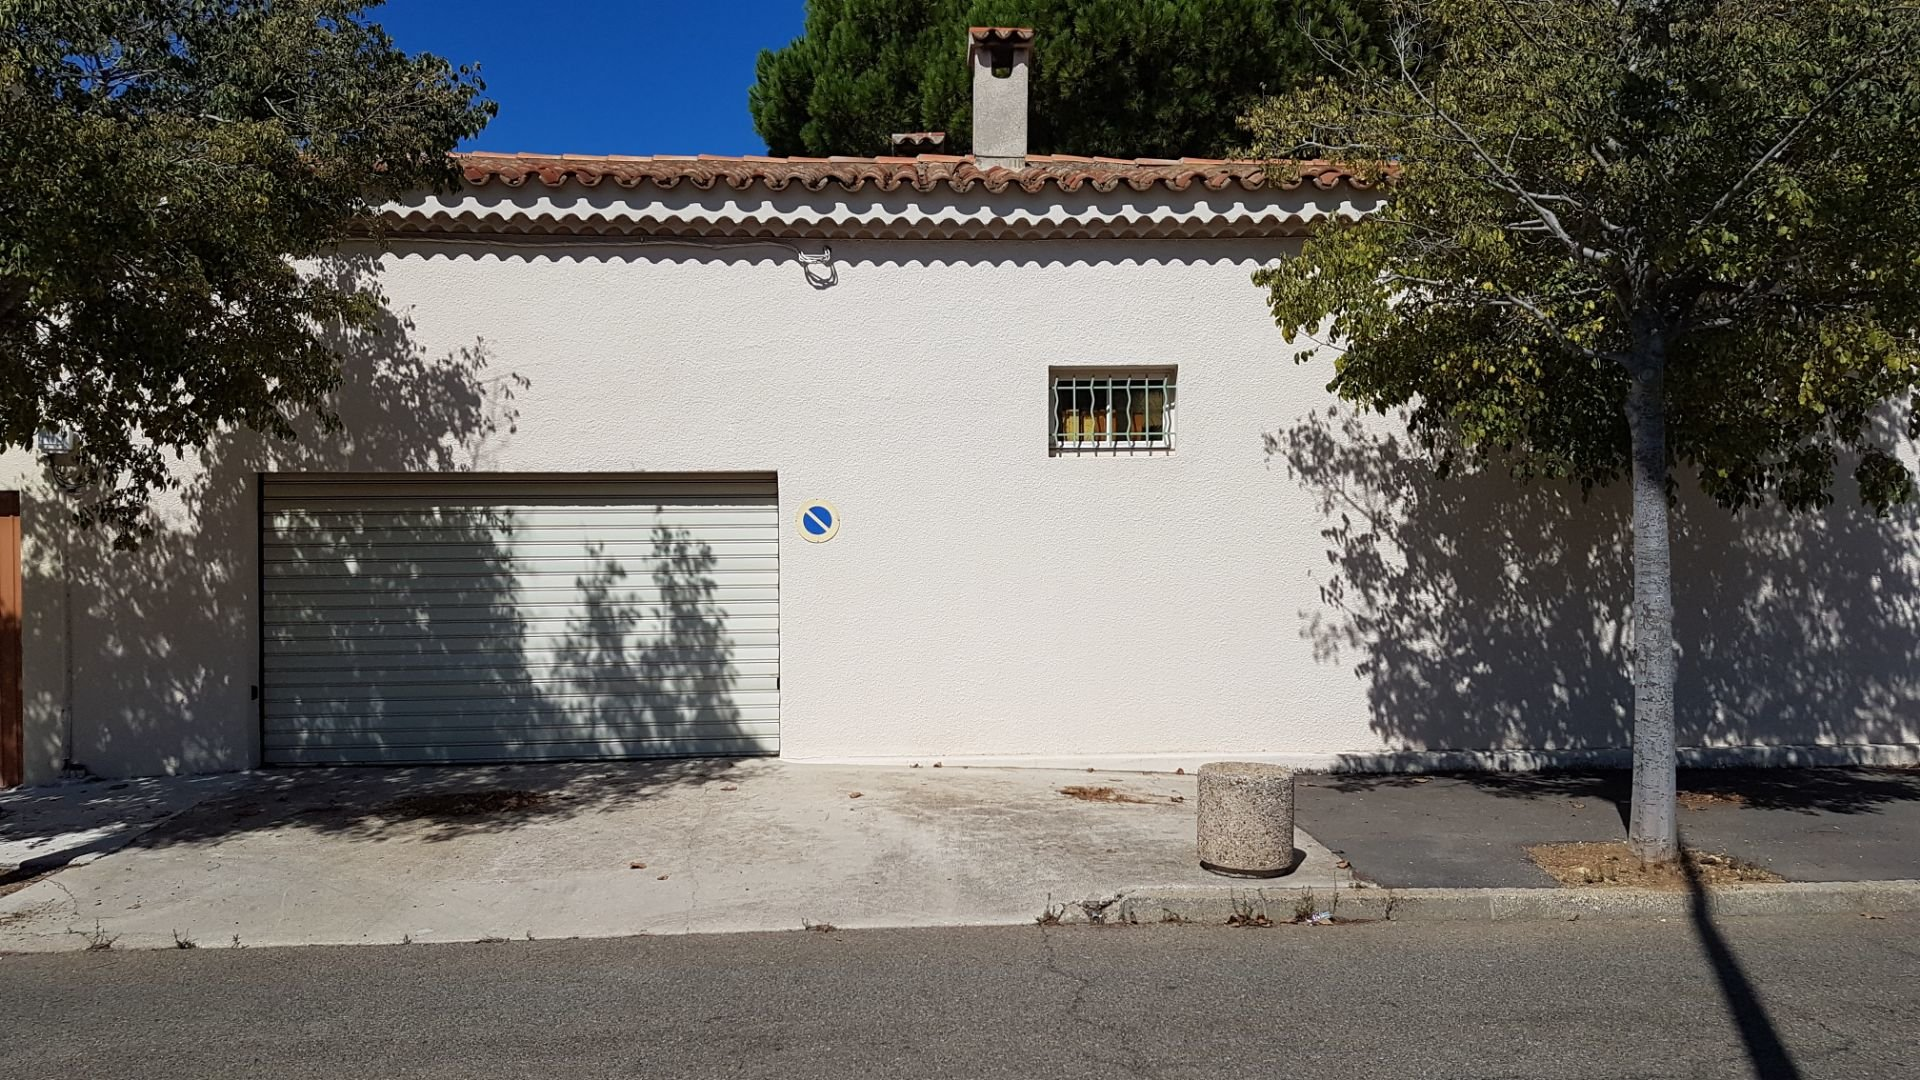 PORT DE BOUC Appartement T4/TERRASSE/ JARDIN/ PARKING